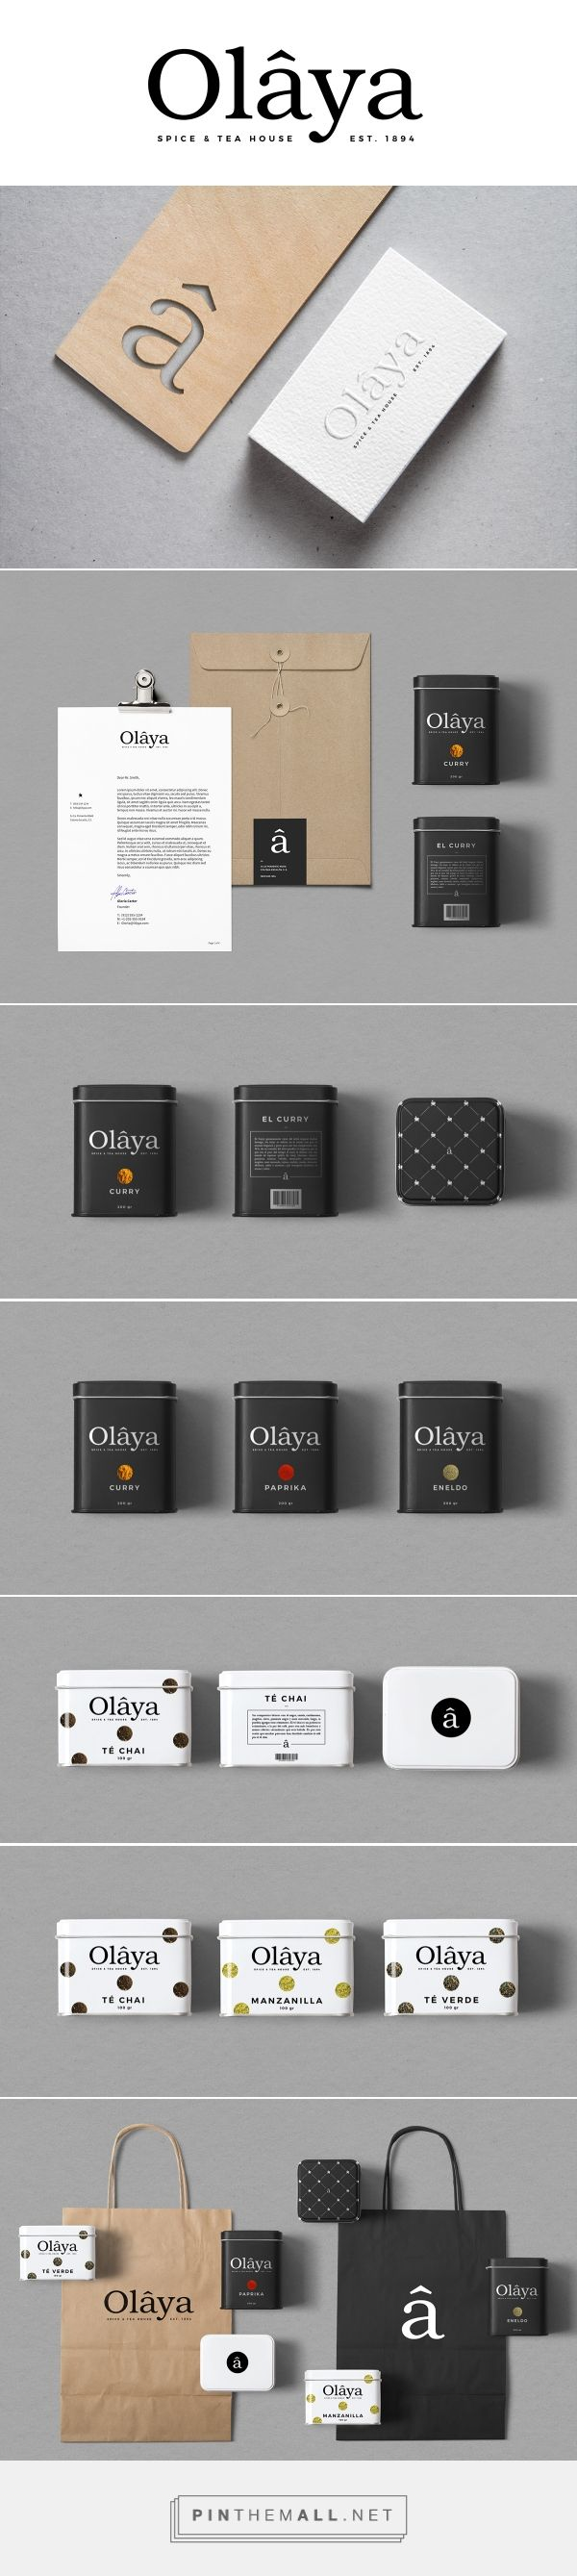 Olâya Branding and Packaging by Elemasele on Behance   Fivestar Branding –…